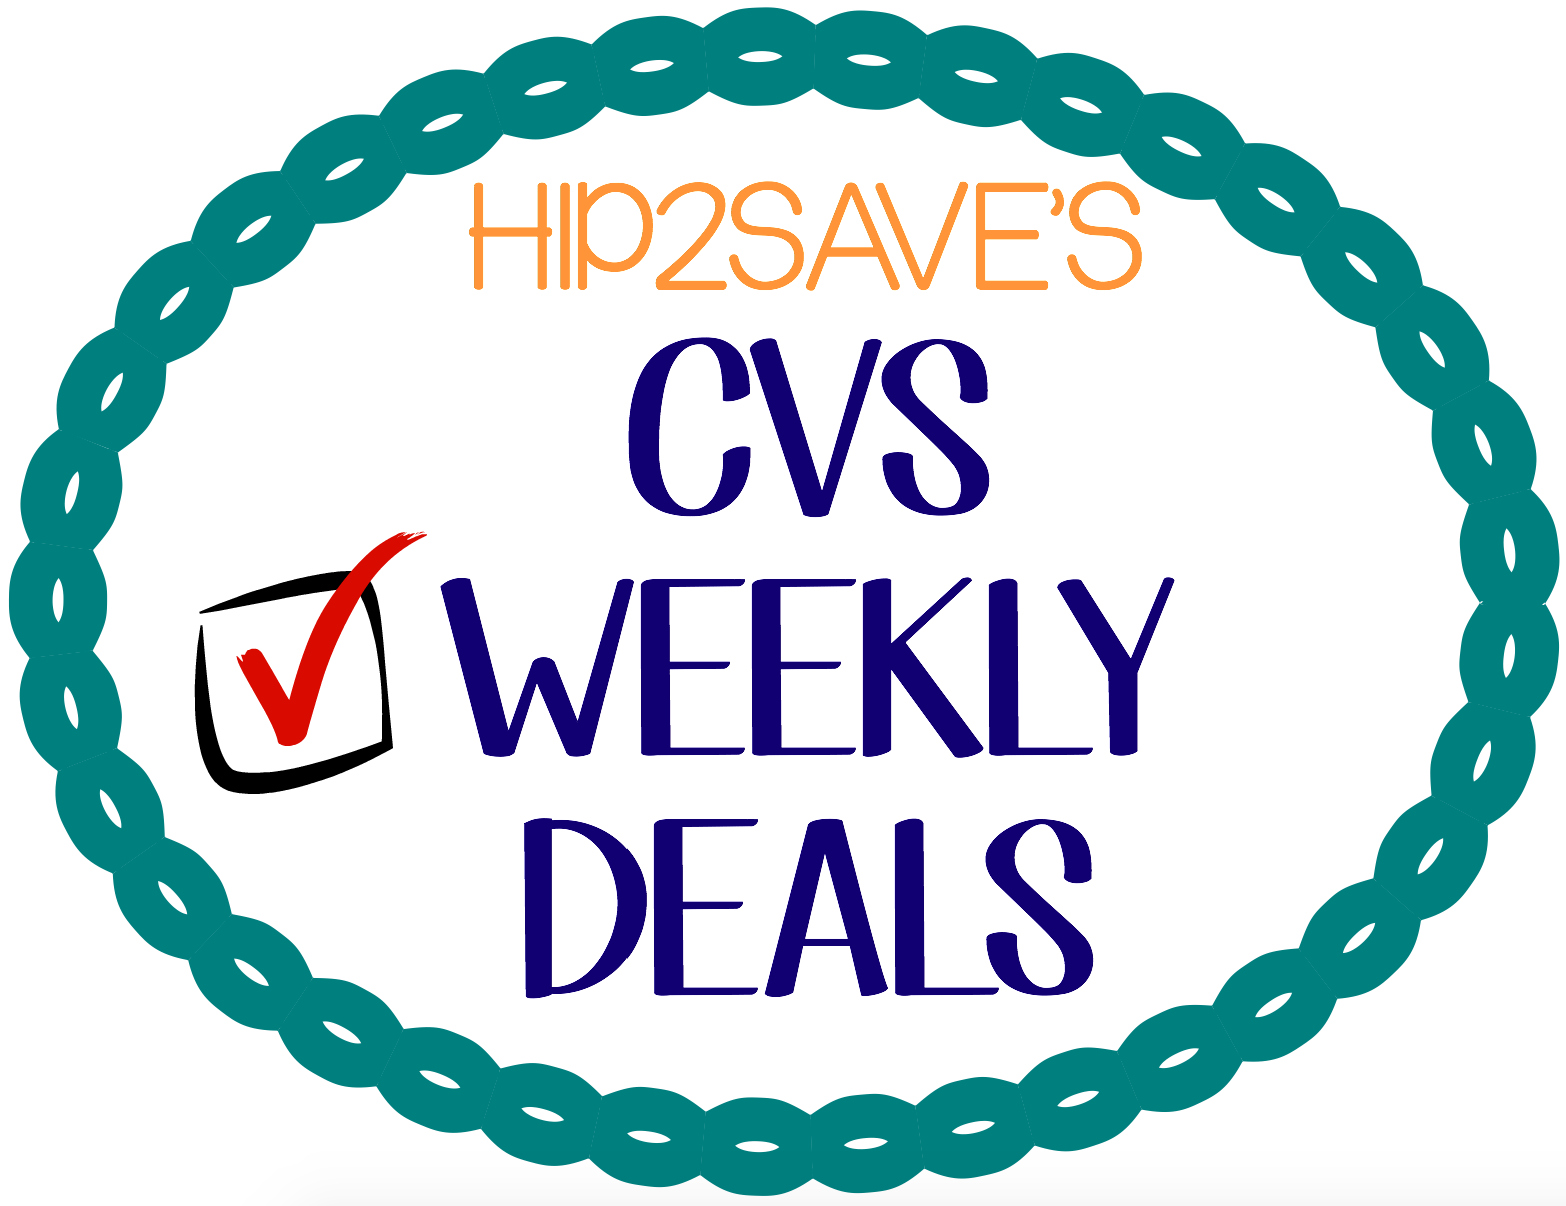 CVS Deals 12/13-12/19 - Hip2Save